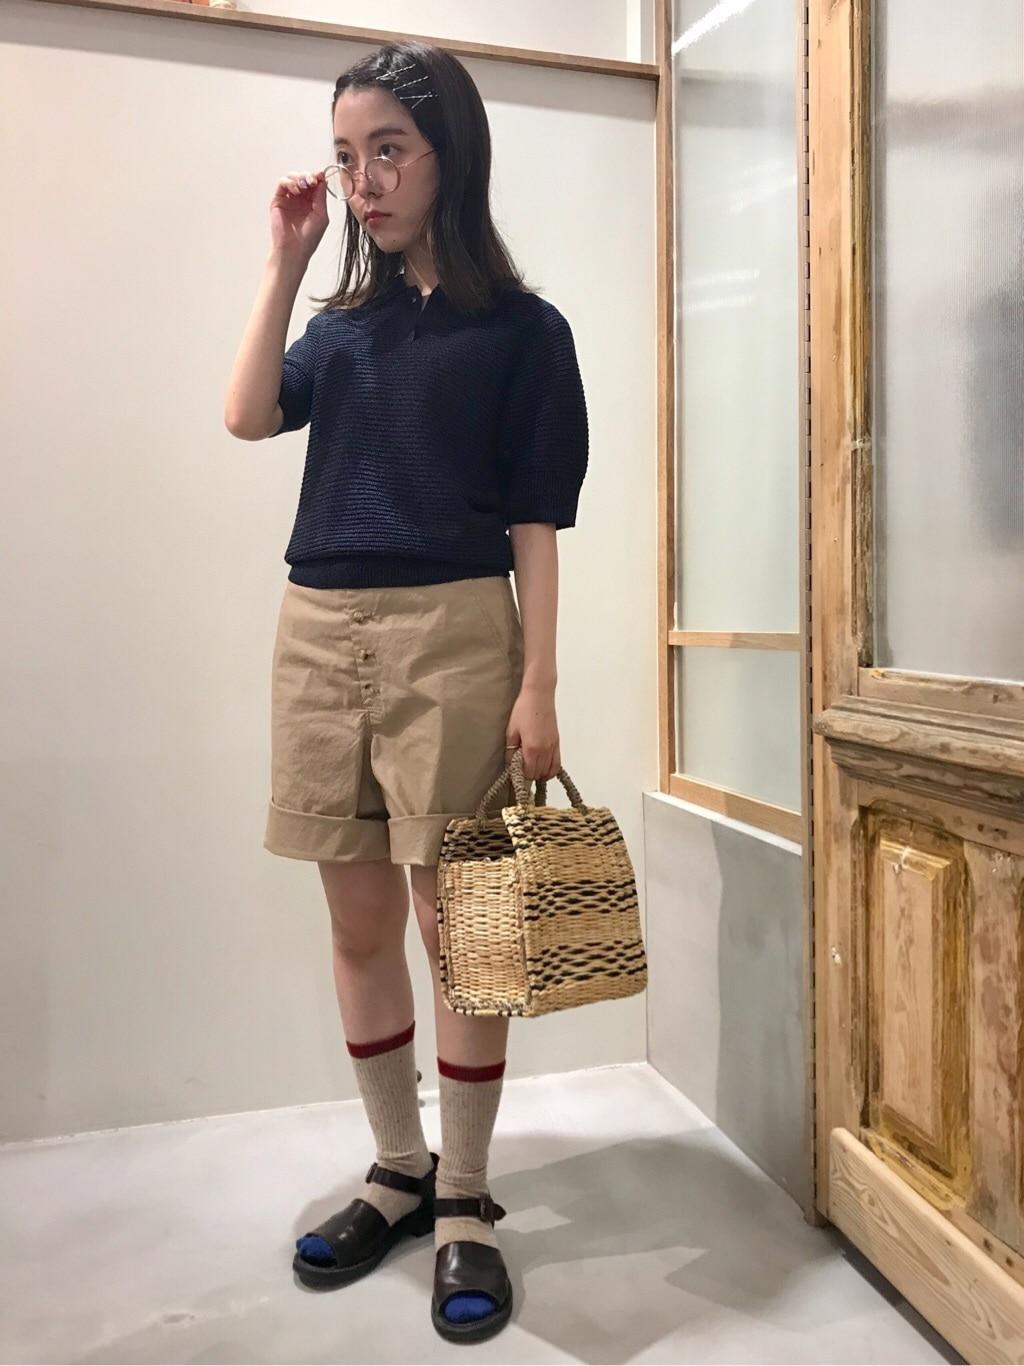 bulle de savon 渋谷スクランブルスクエア 身長:153cm 2020.08.04